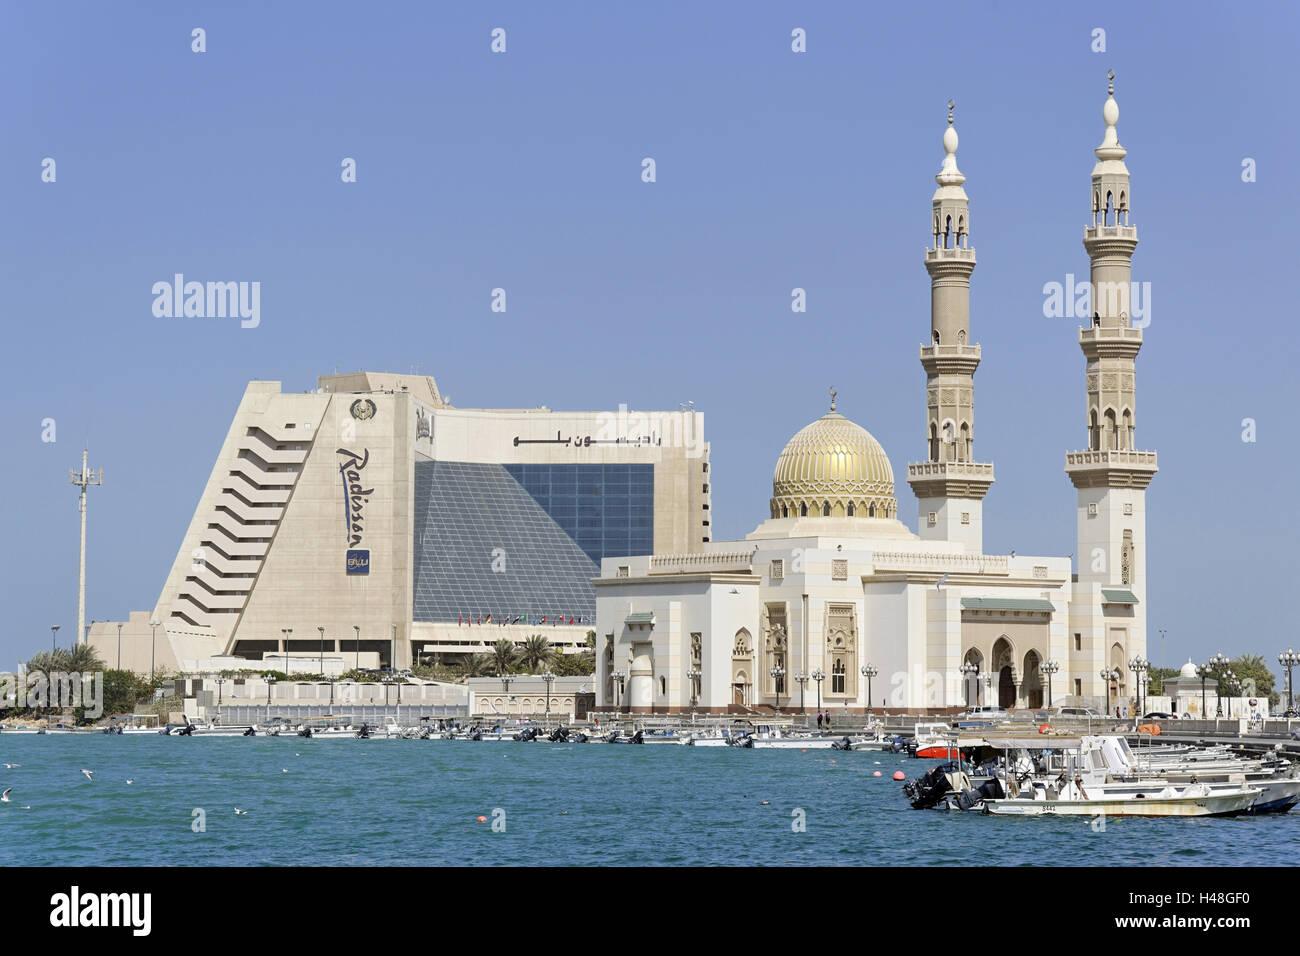 Five-star hotel Radisson Blu, Corniche Road, emirate Sharjah, United Arab Emirates, Arabian peninsula, the Middle - Stock Image